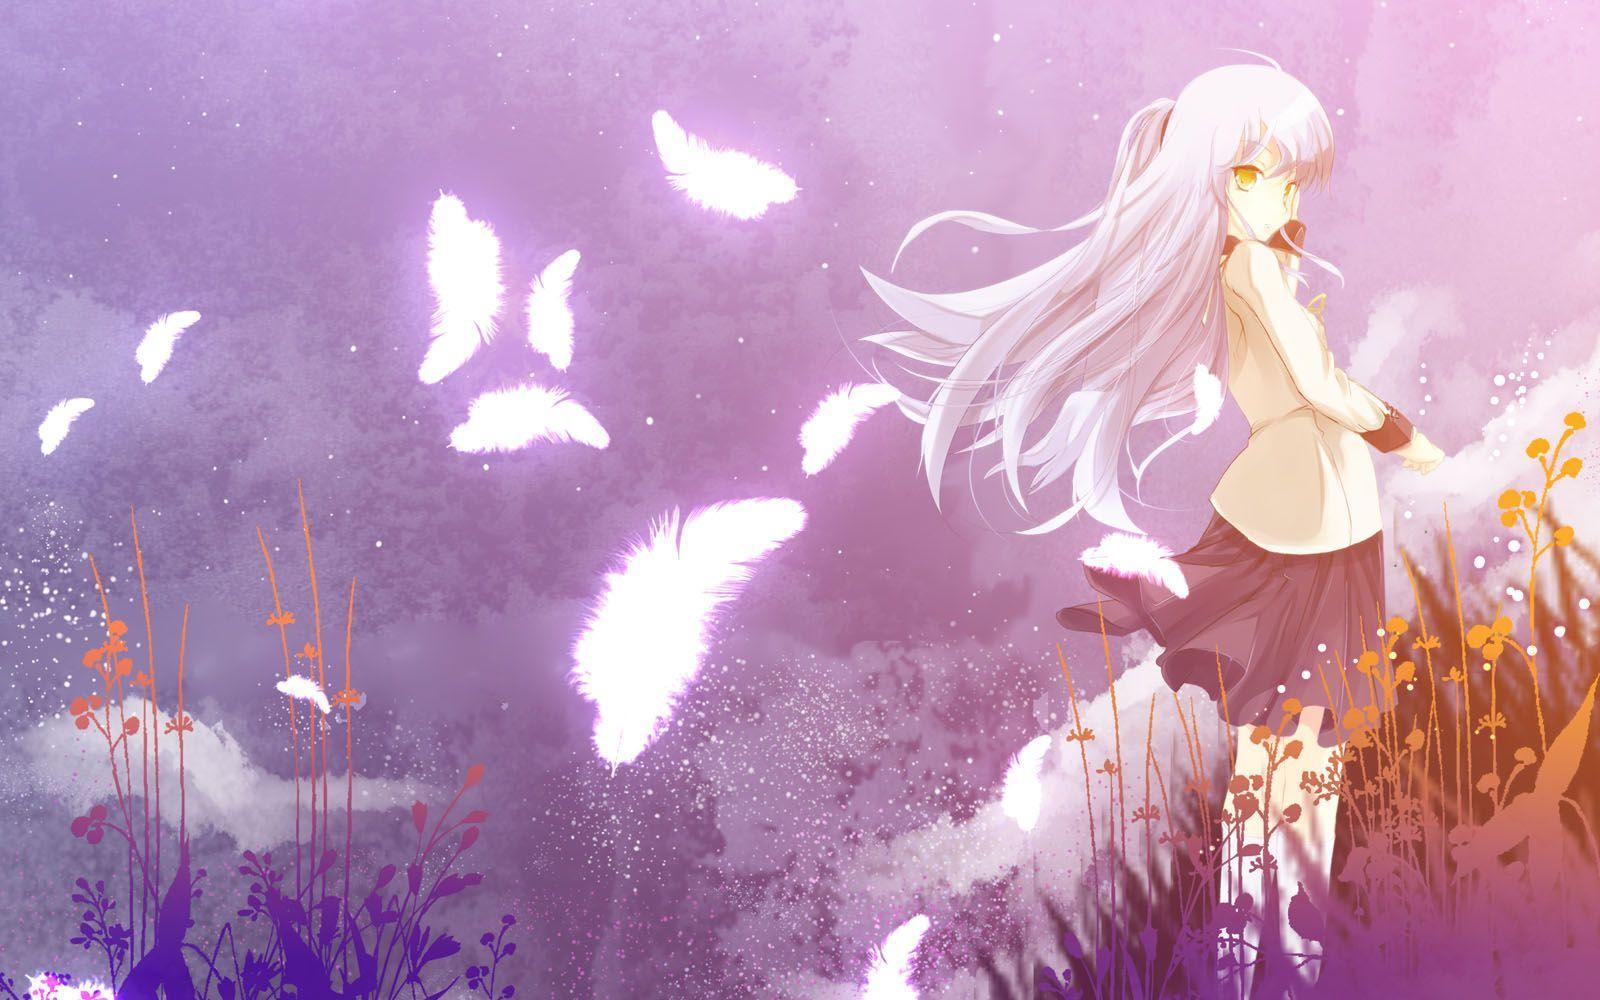 Anime Angel Beats Wallpaper Angel Beats Anime Angel Beats Anime Angel